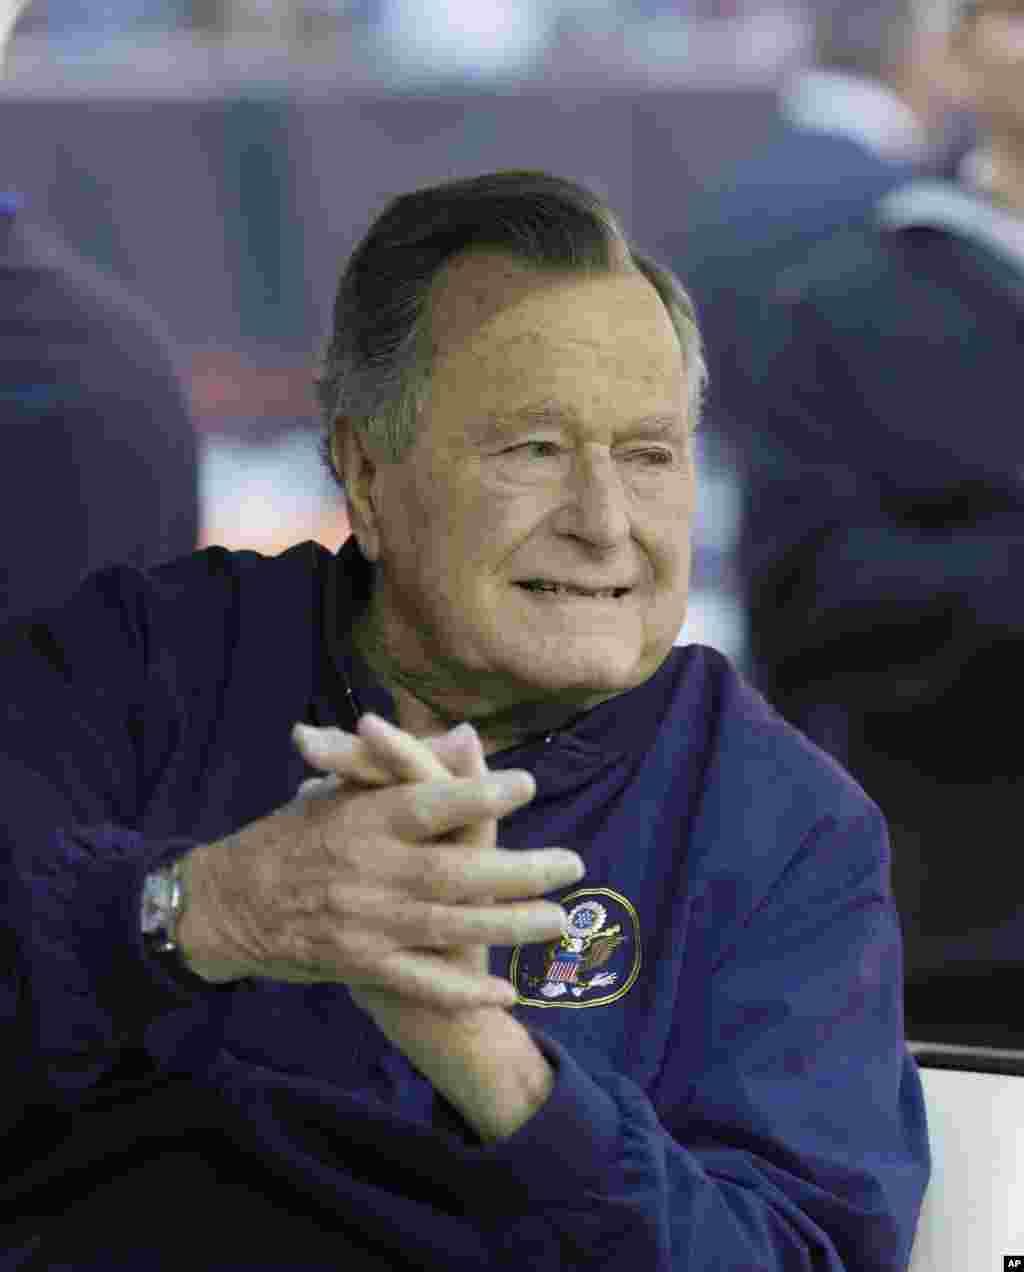 Mantan presiden George H. W. Bush menonton pertandingan football NFL antara Houston Texans dan Cincinnati Bengals, Houston, 23 November 2014.